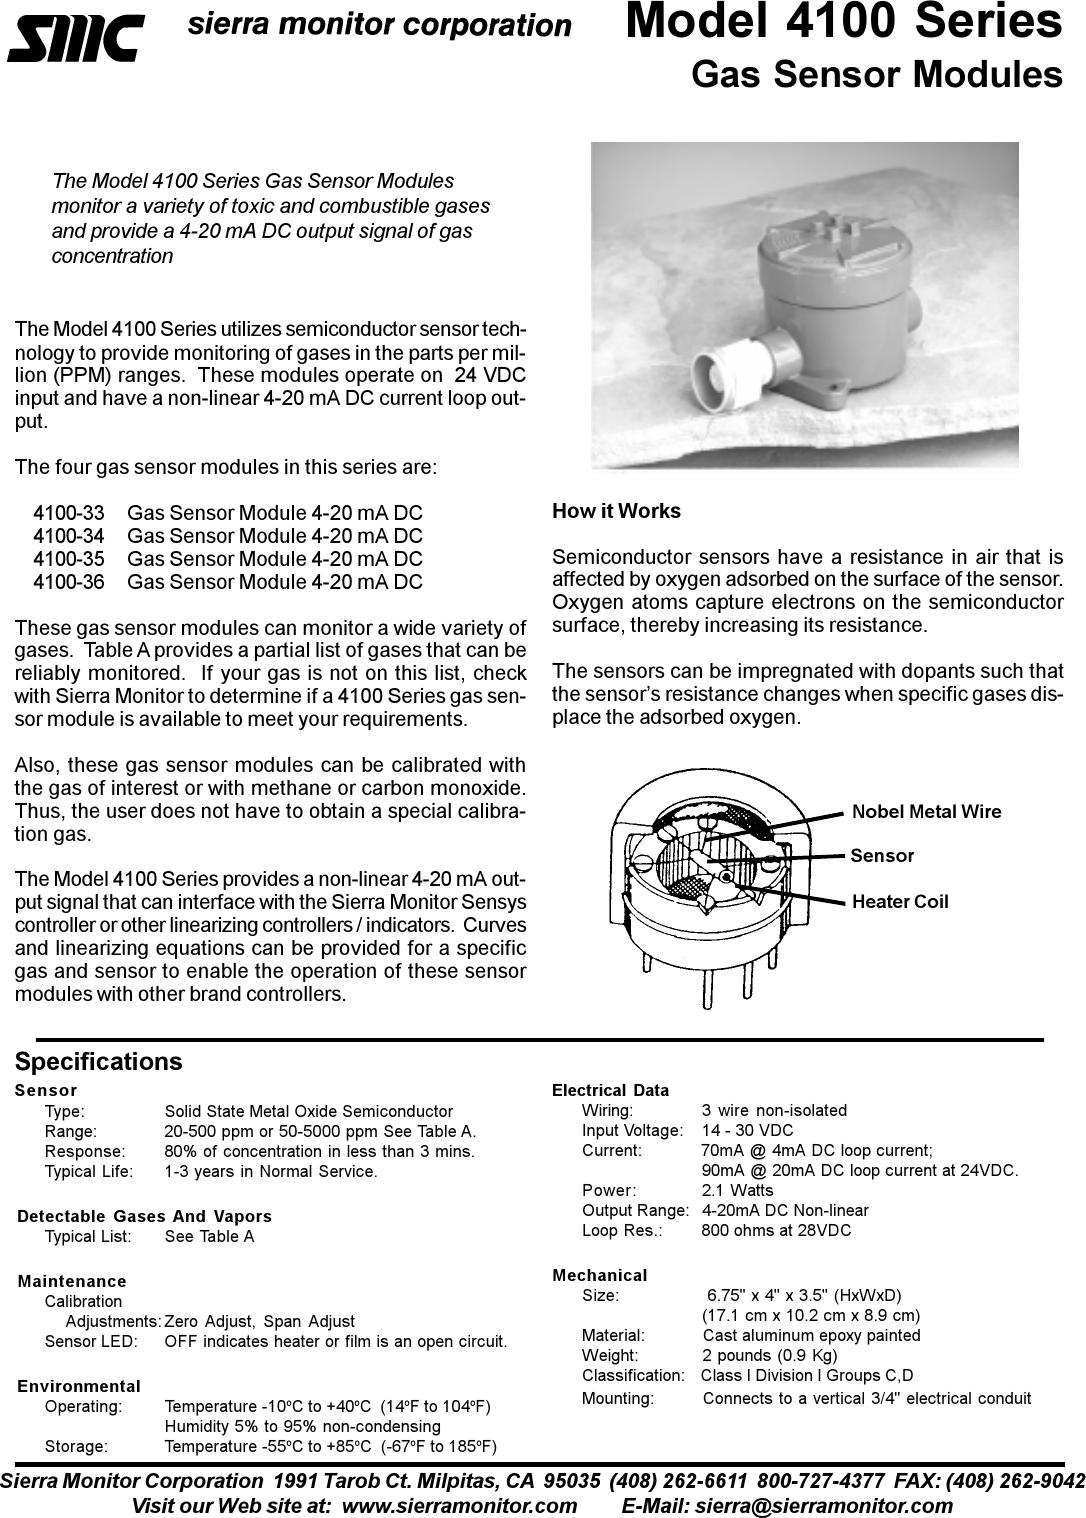 Sierra Monitor Corporation 4100 Series Users Manual 4100pdf